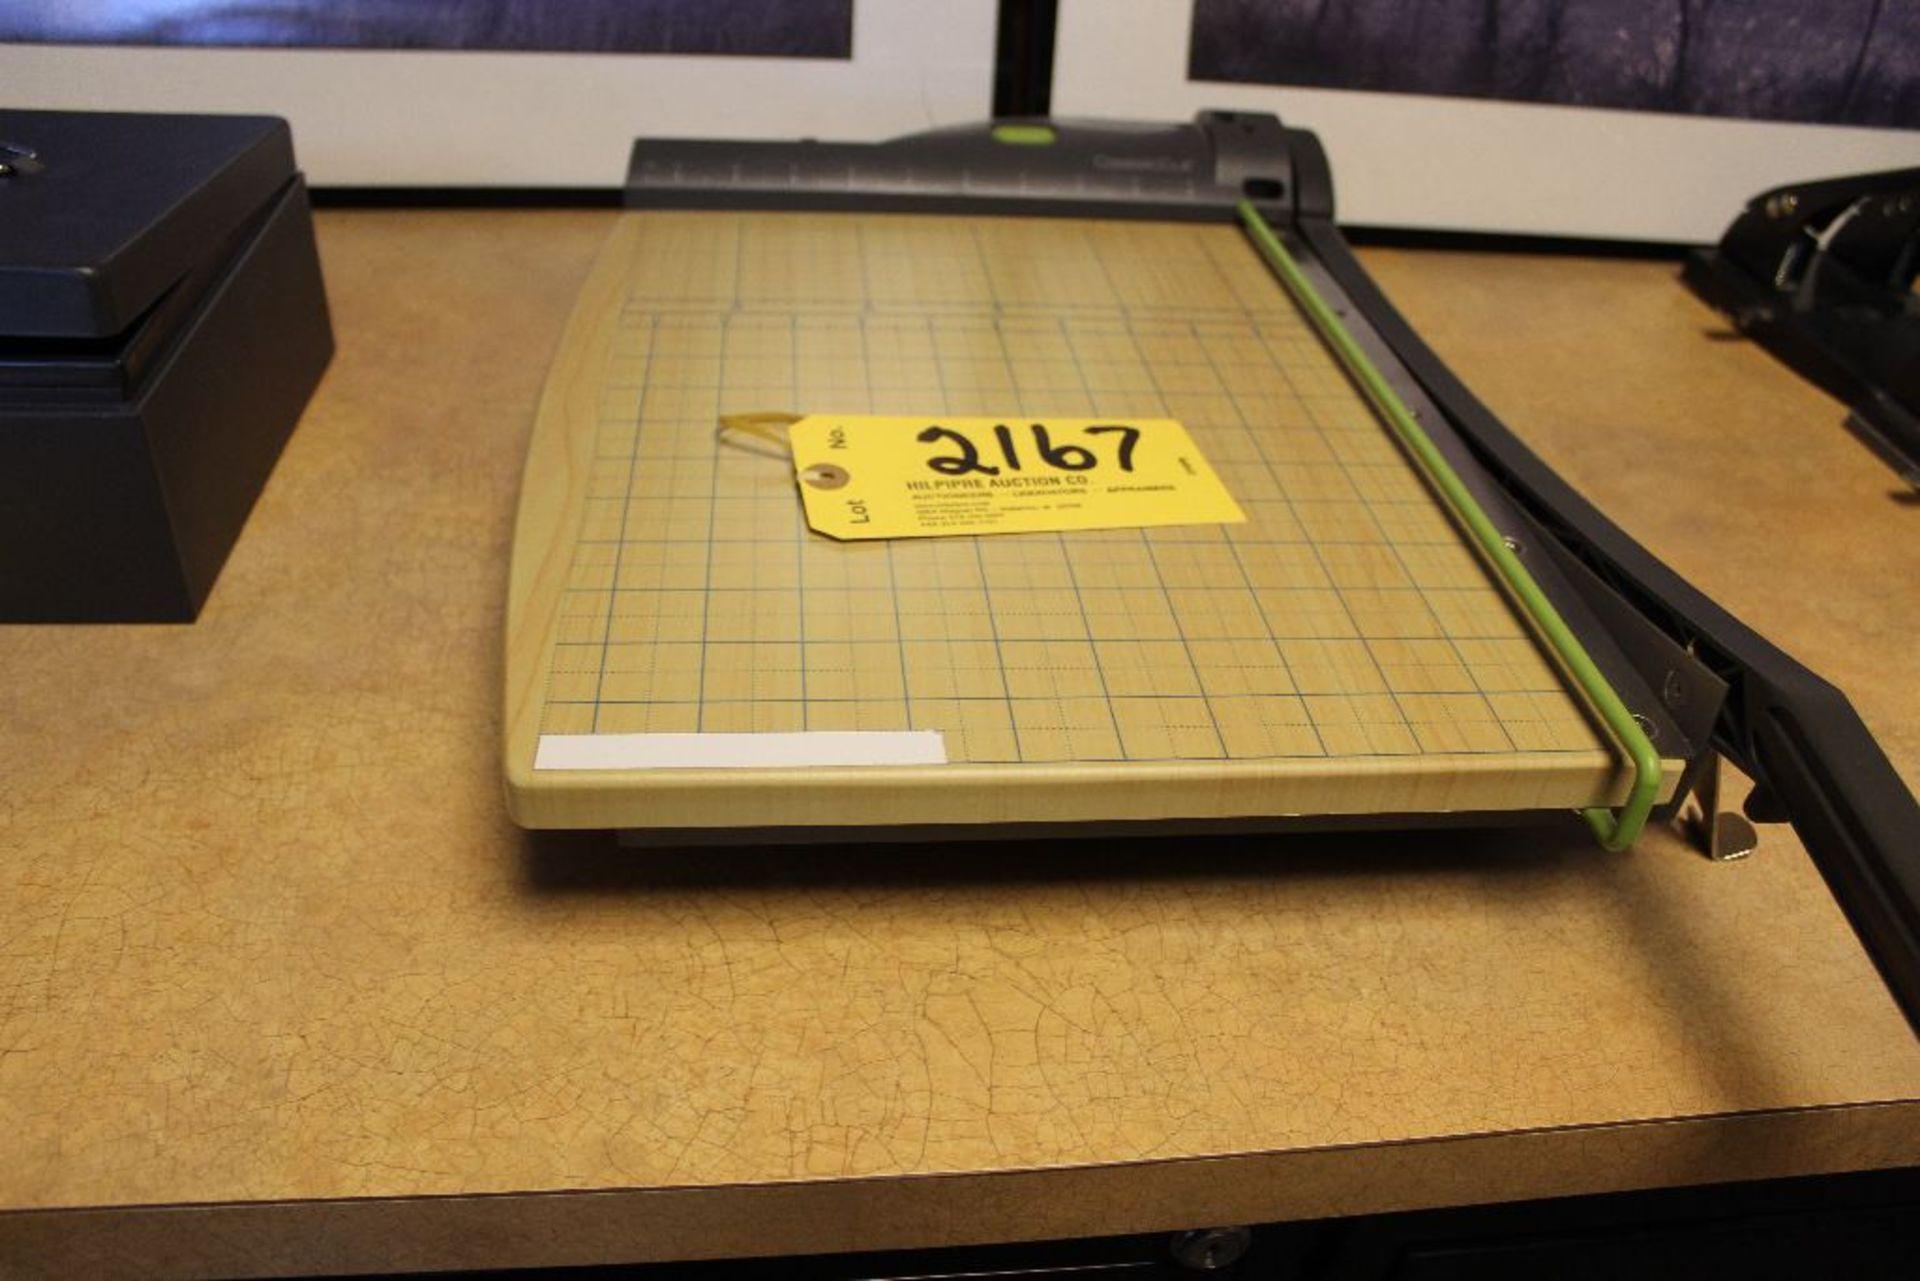 "Lot 2167 - Swingline paper cutter, 11"" x 15"" paper size."